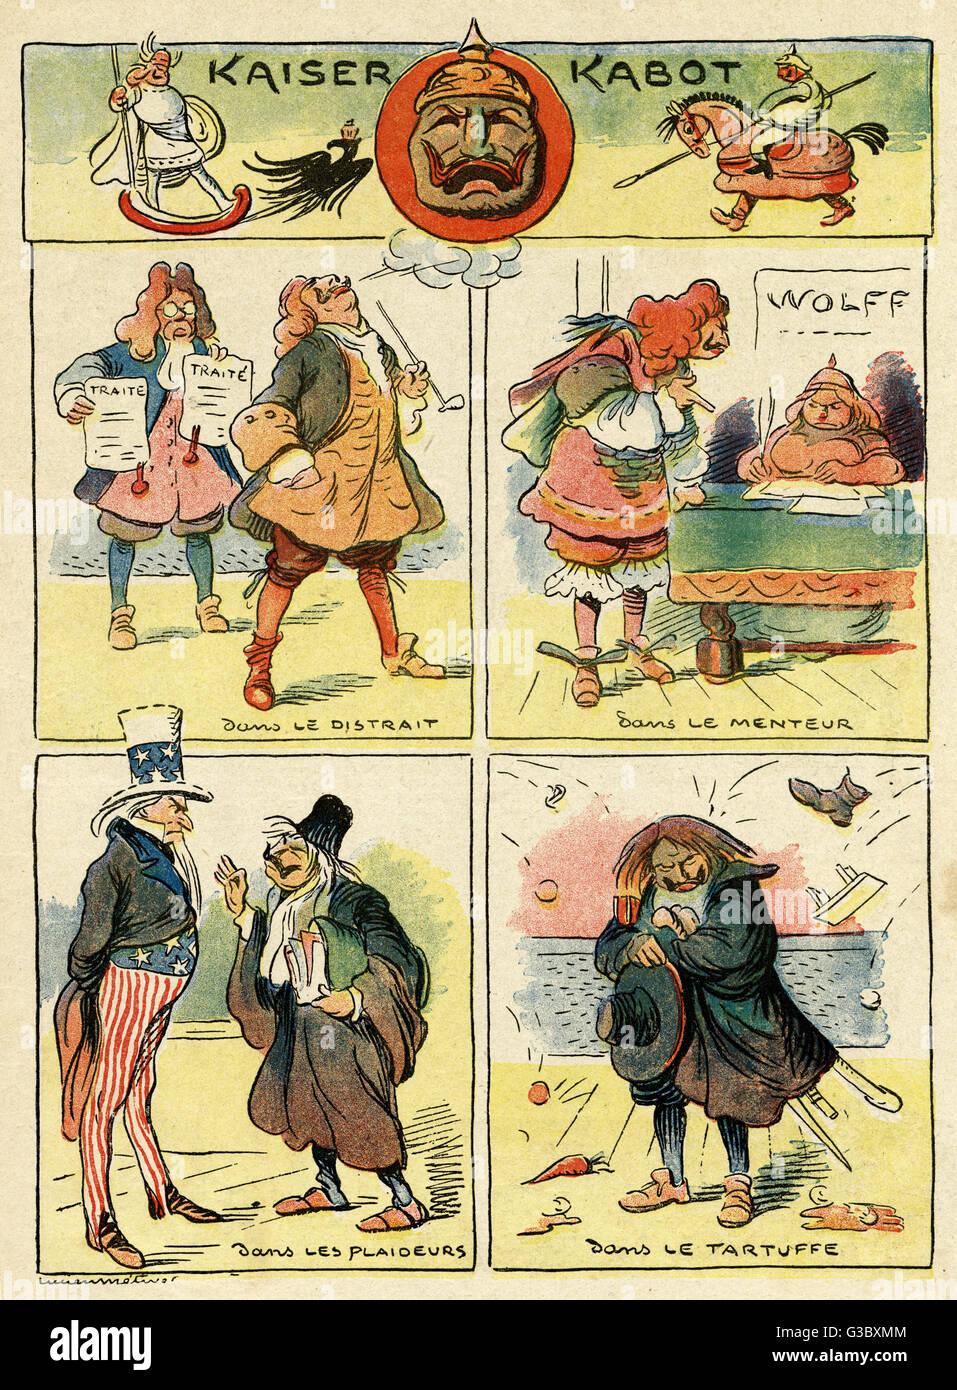 Cartoon, Kaiser Kabot (Kaiser Wilhelm II, le jambon), avec l'acteur allemand Kaiser en quatre différents Photo Stock